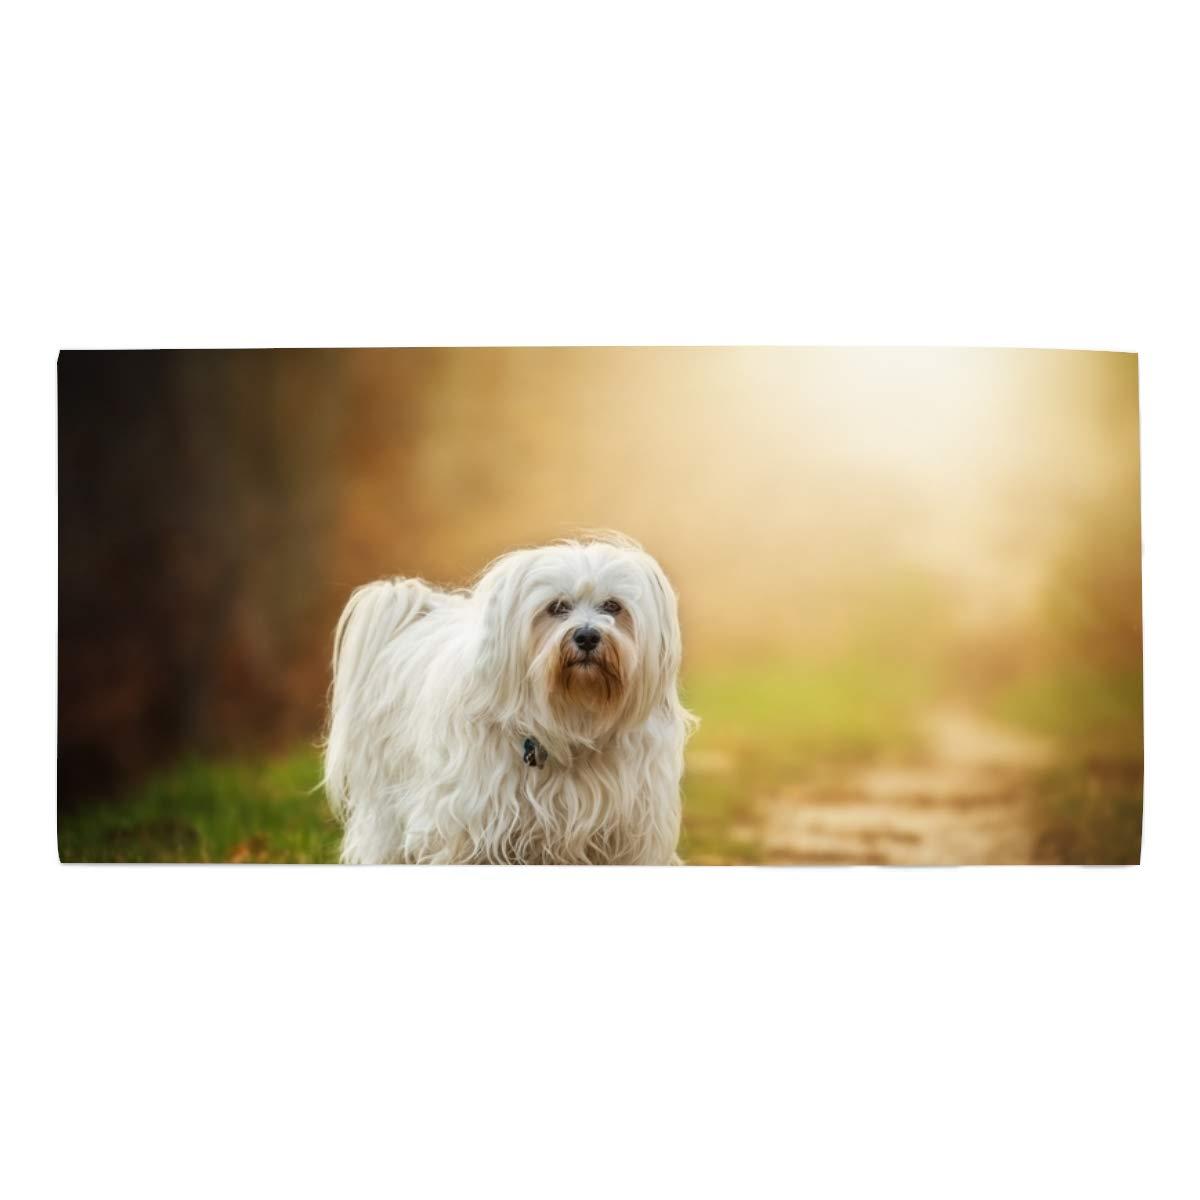 Amazon com: Adorable Yorkie Dog Printed Face Hair or Bath